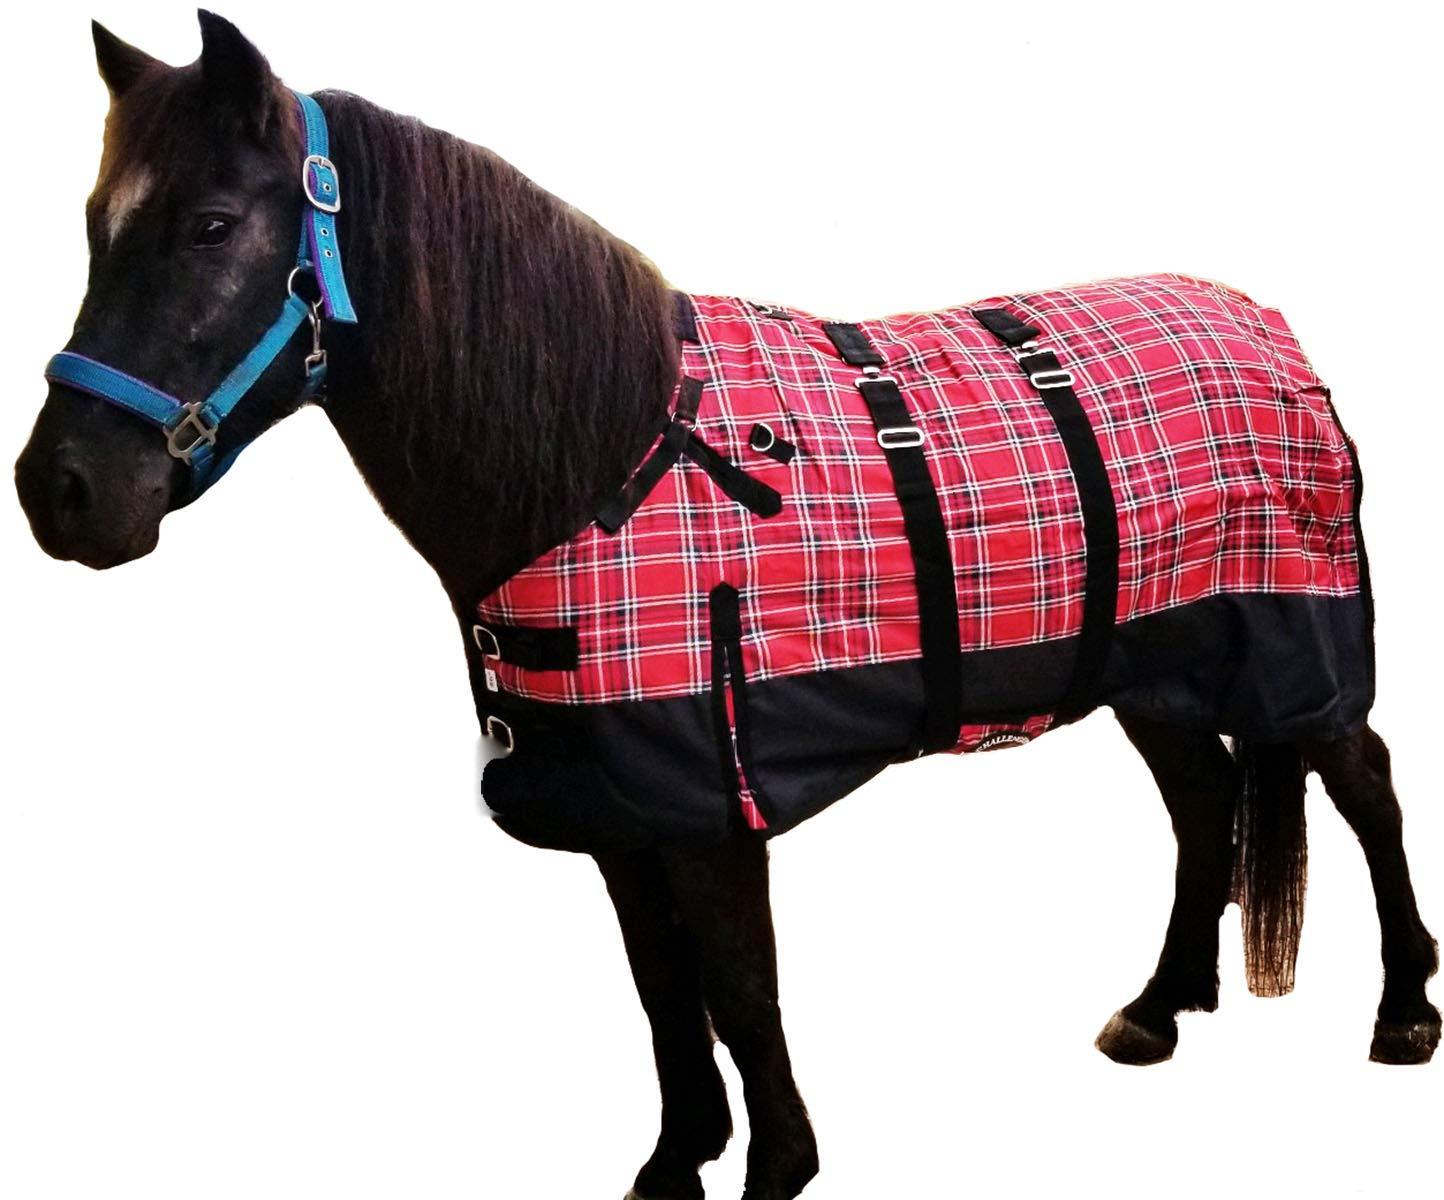 CHALLENGER 1000D Miniature Weanling Pony Foal Horse Winter Blanket Bellyband 51957B